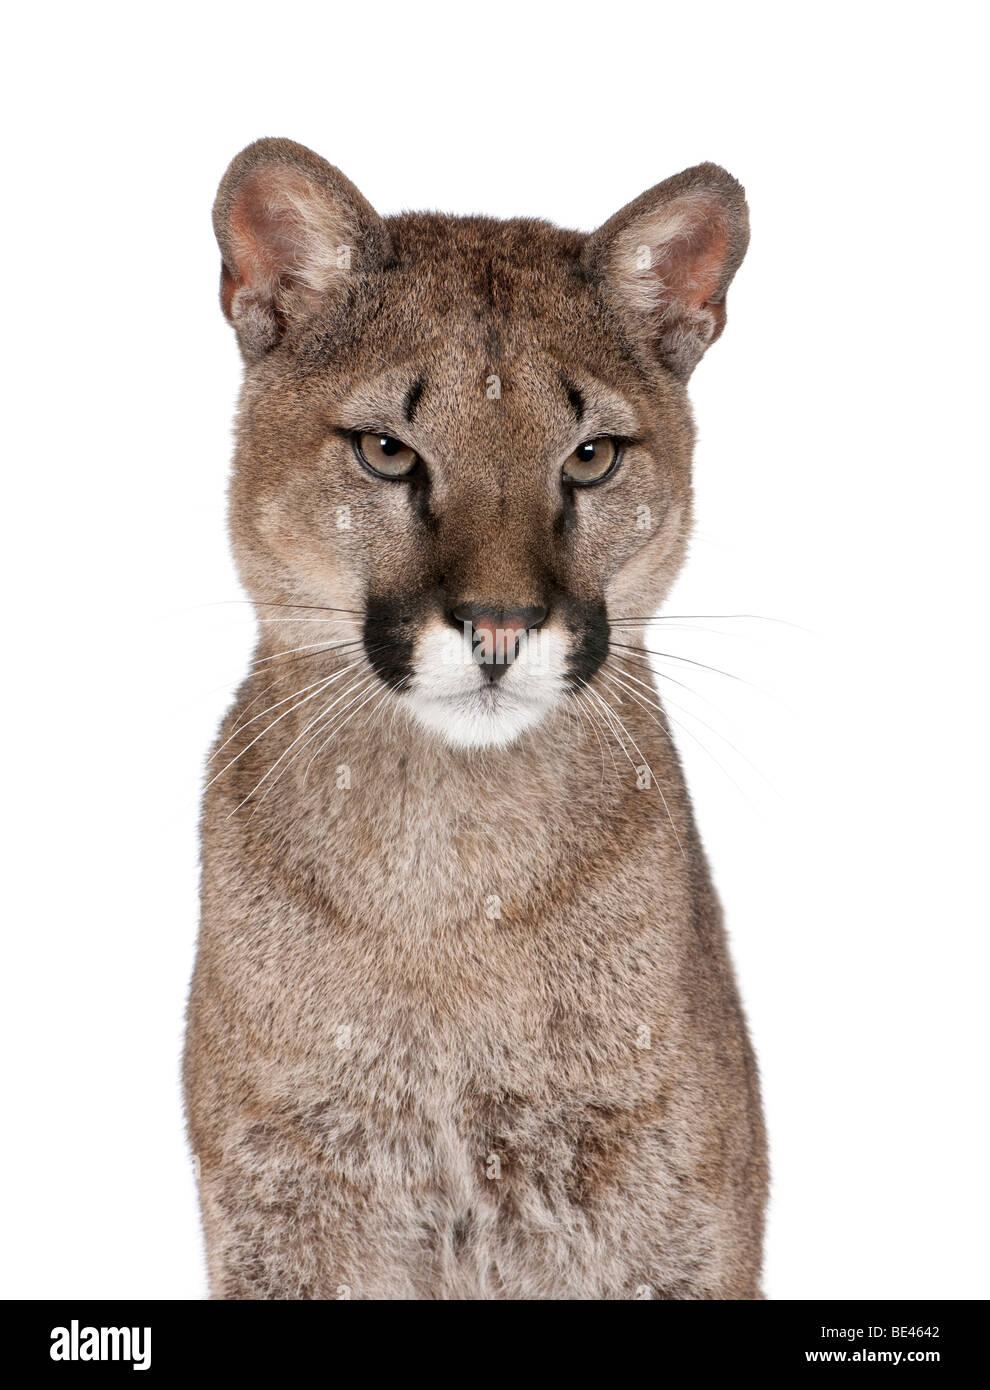 Portrait of Puma cub, Puma concolor, 1 year old, against white background, studio shot - Stock Image